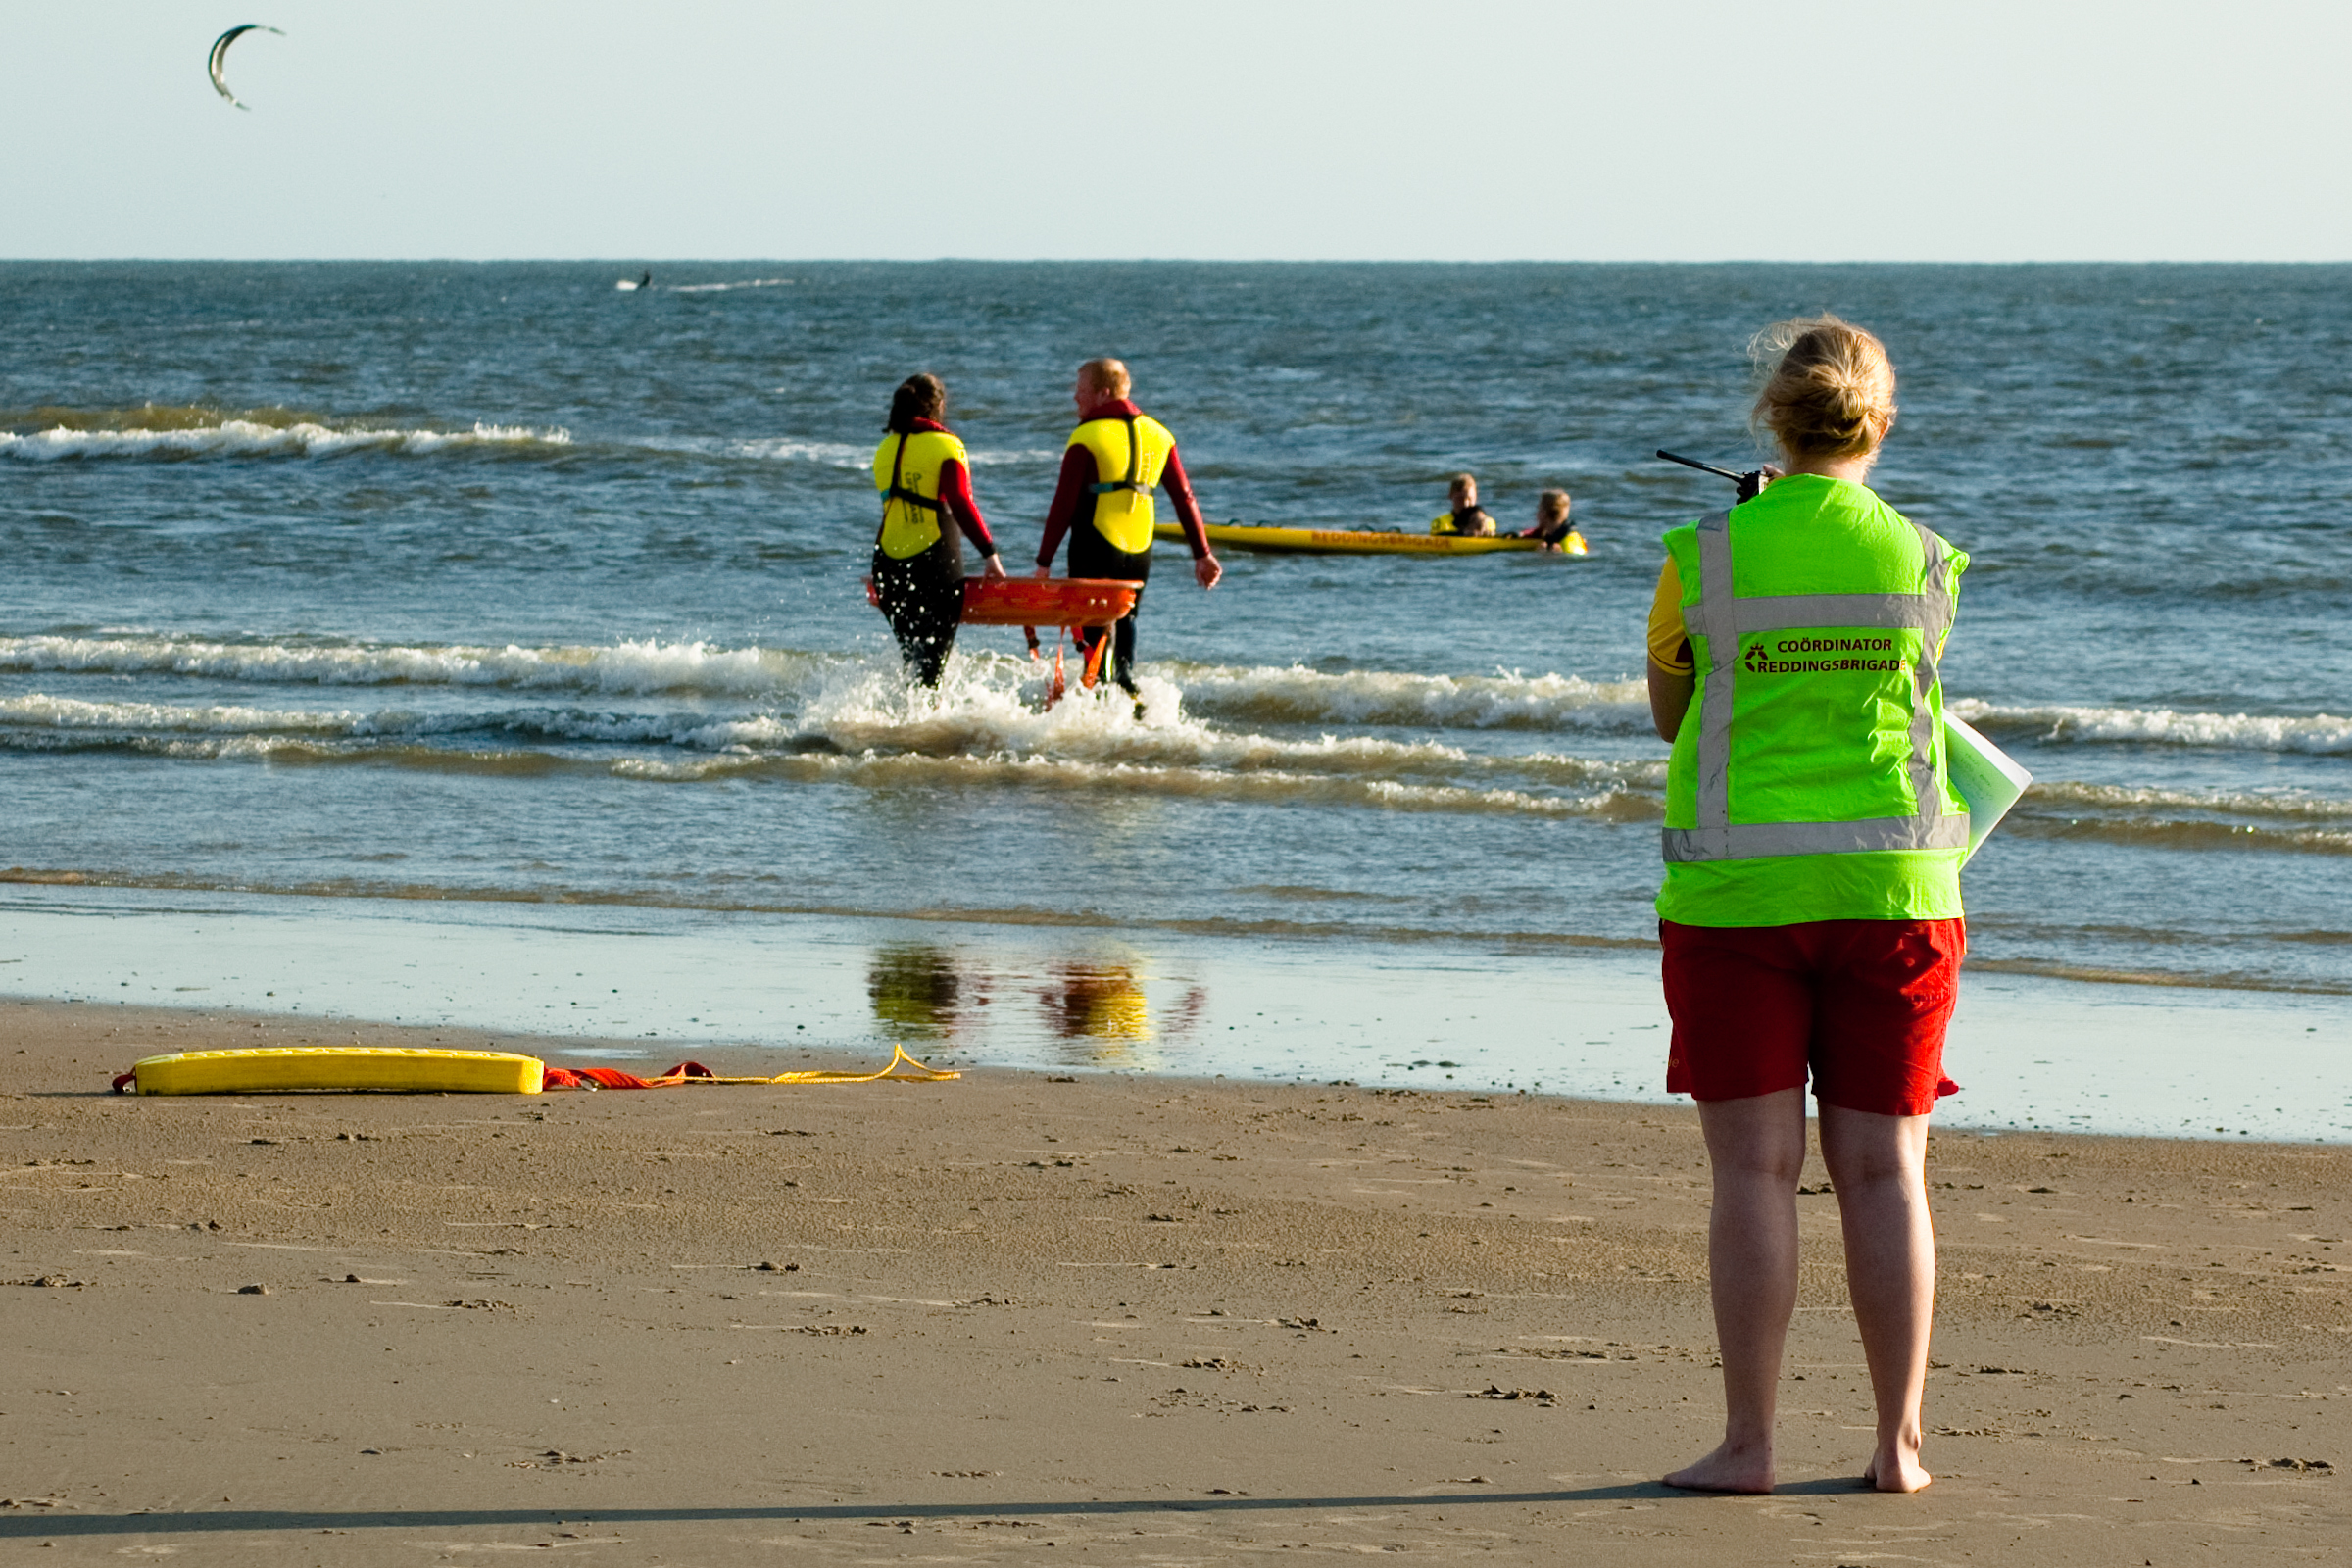 Senior Lifeguard opleiding leidinggeven reddingsbrigade IJmuiden IJRB